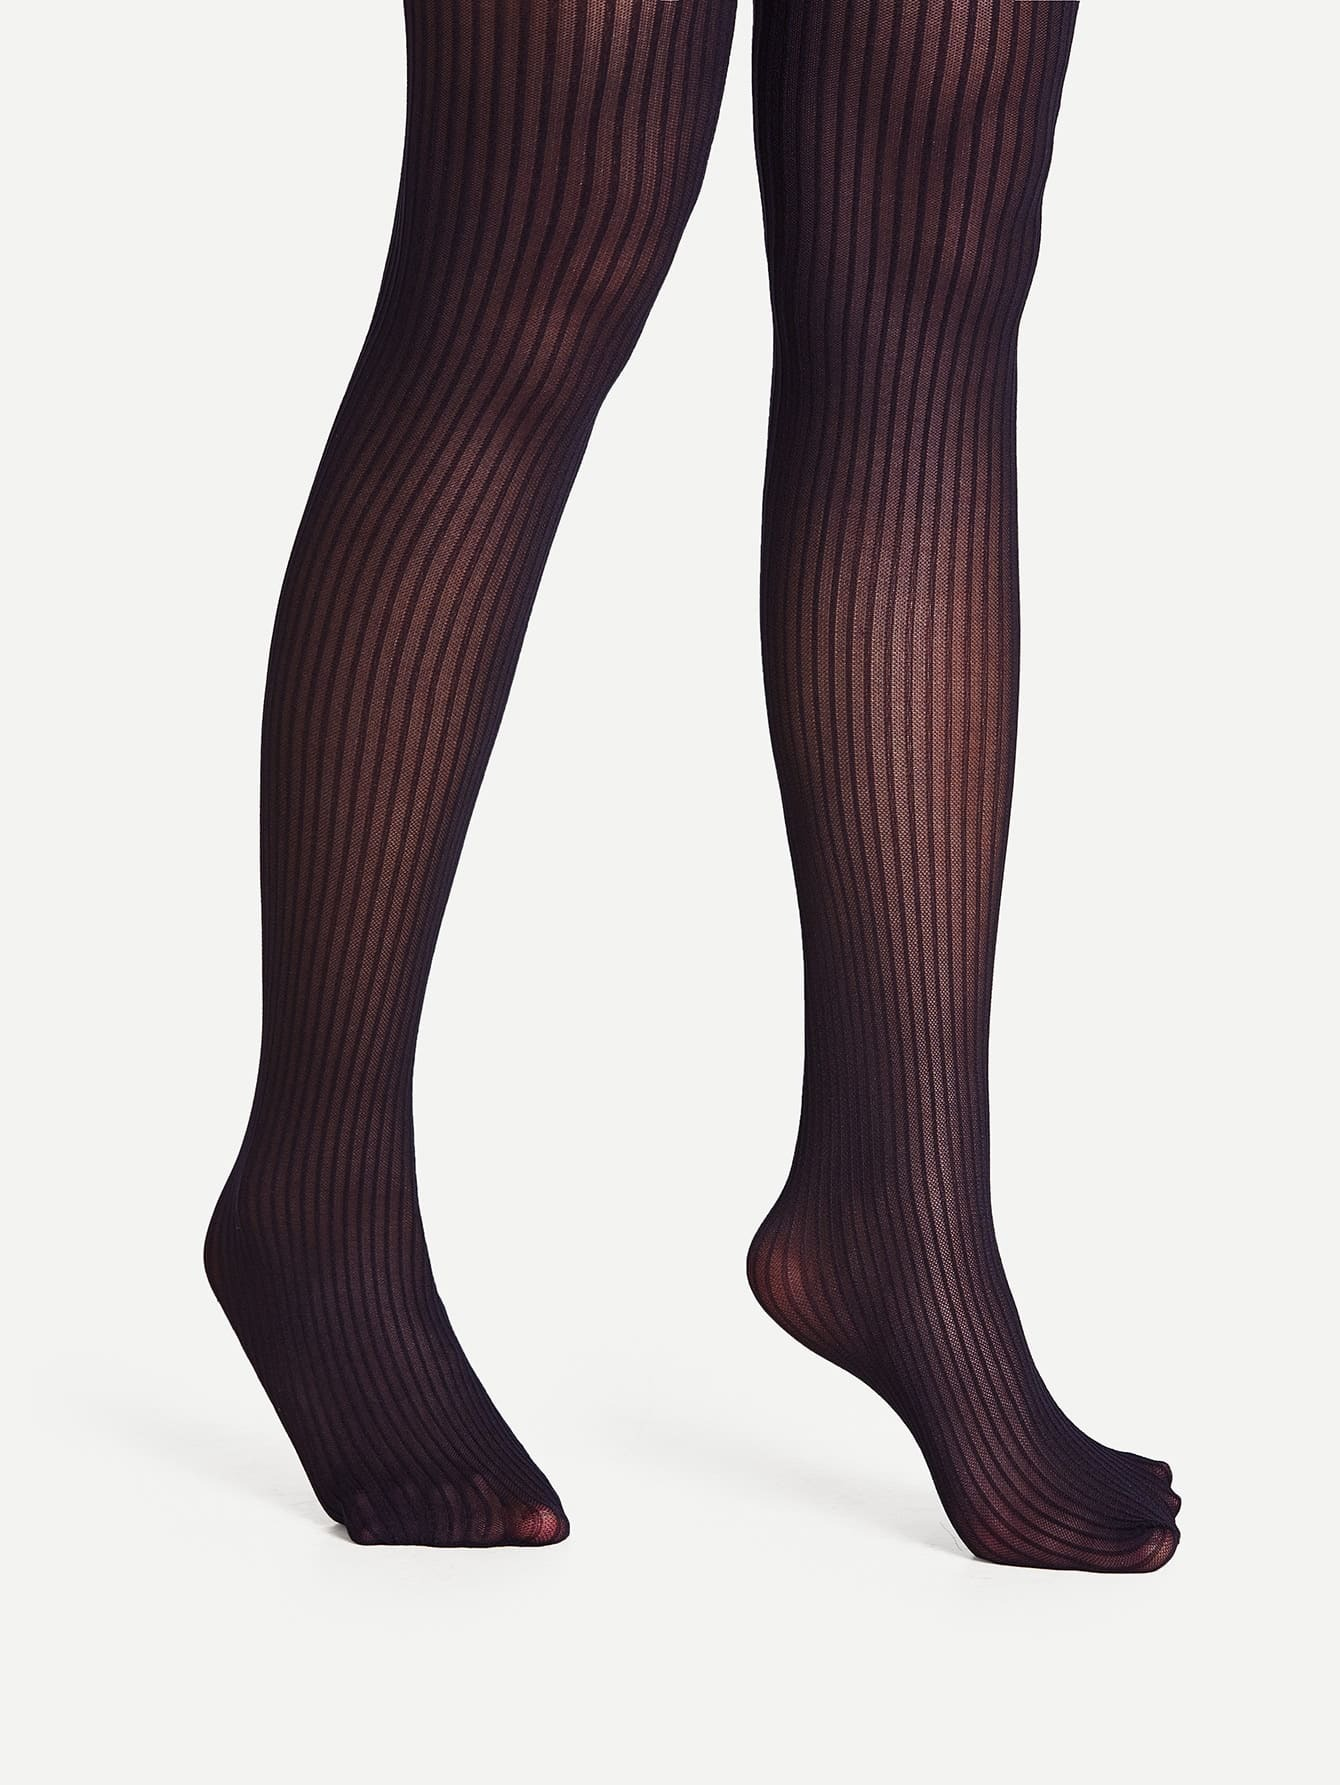 Vertical Striped Design Pantyhose Stockings mesh design pantyhose stockings